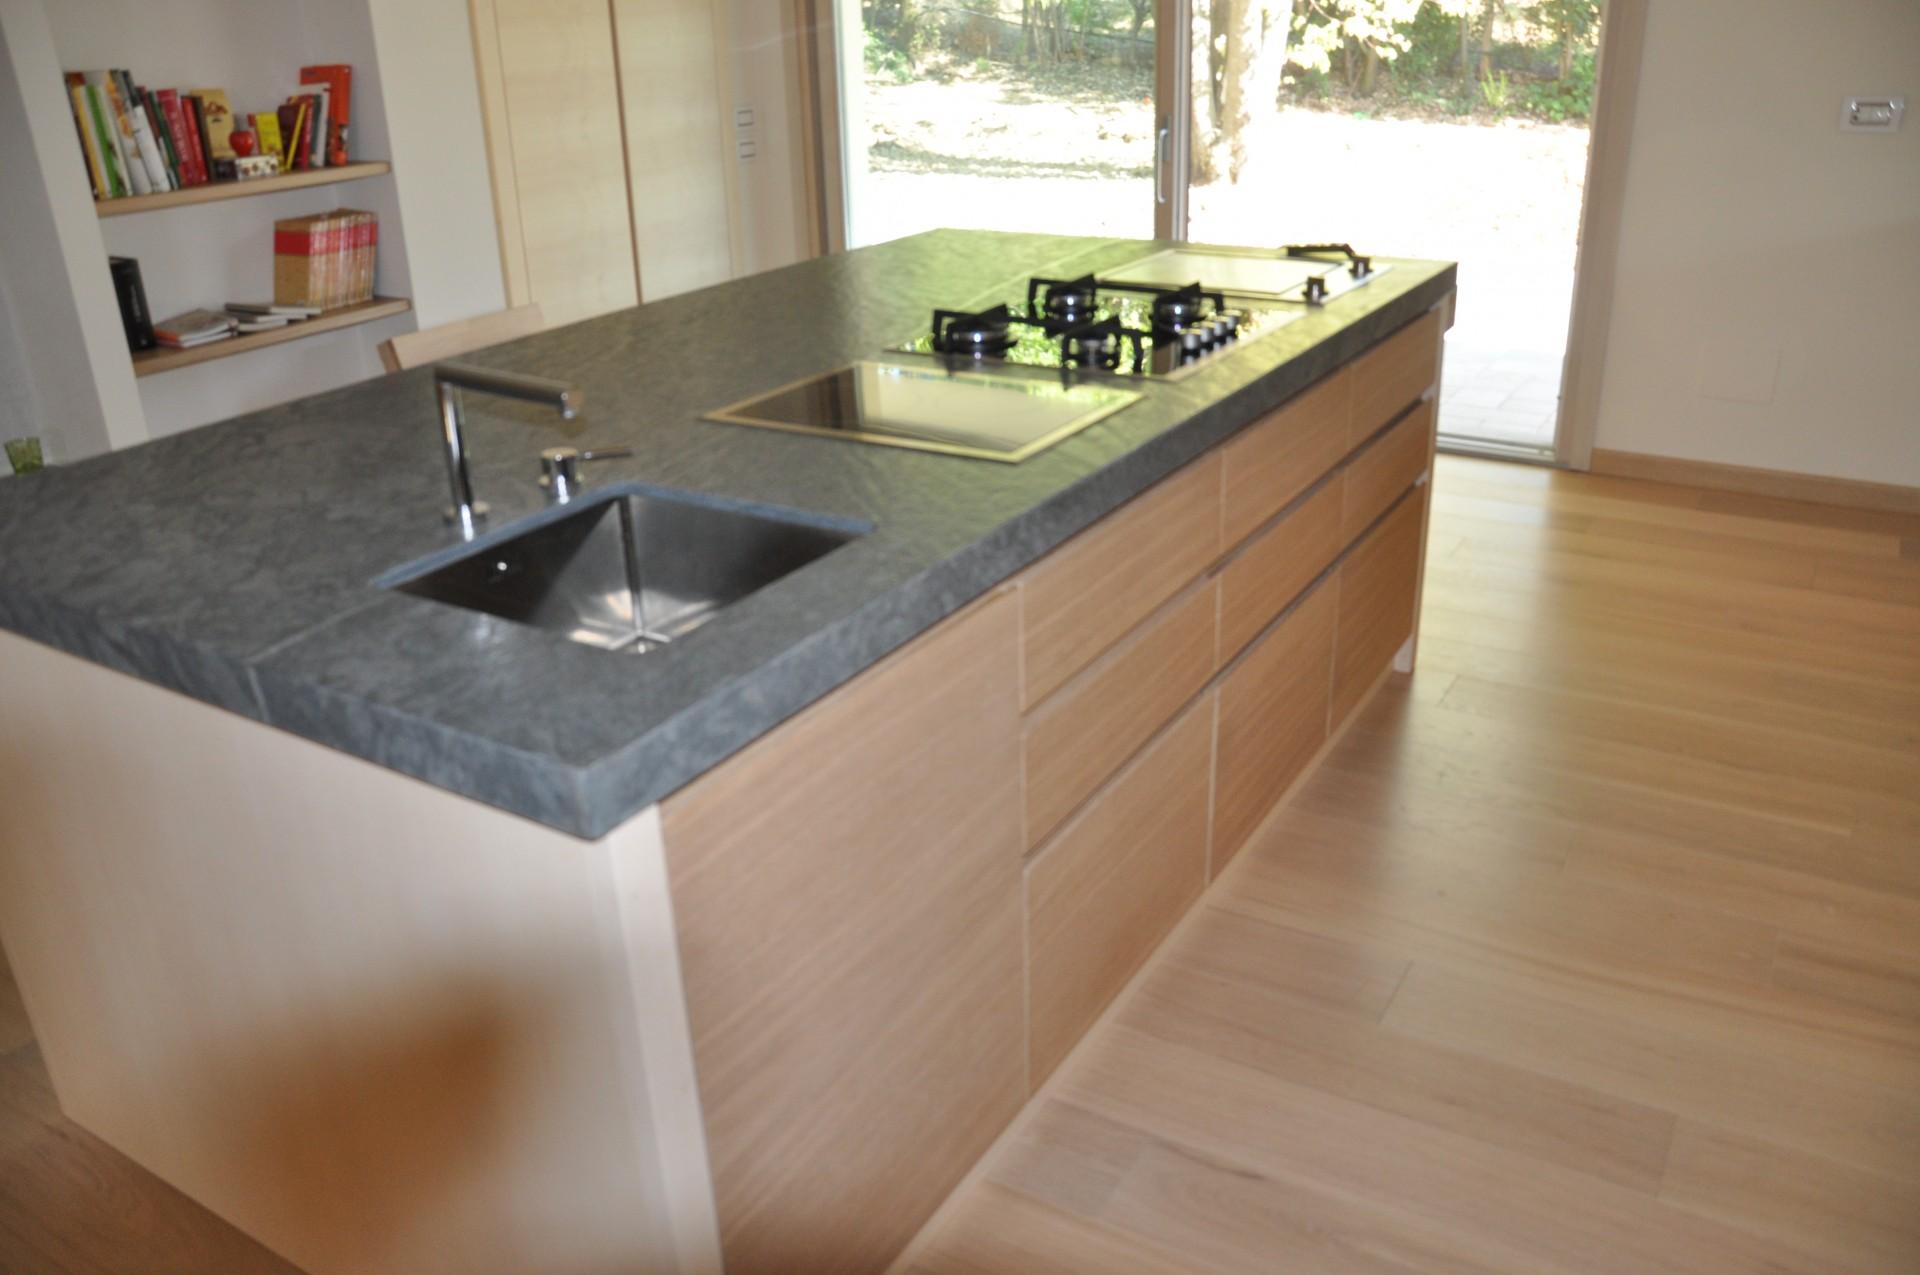 Cucine moderne con isola centrale cucina moderna in legno - Aurora cucine prezzi ...